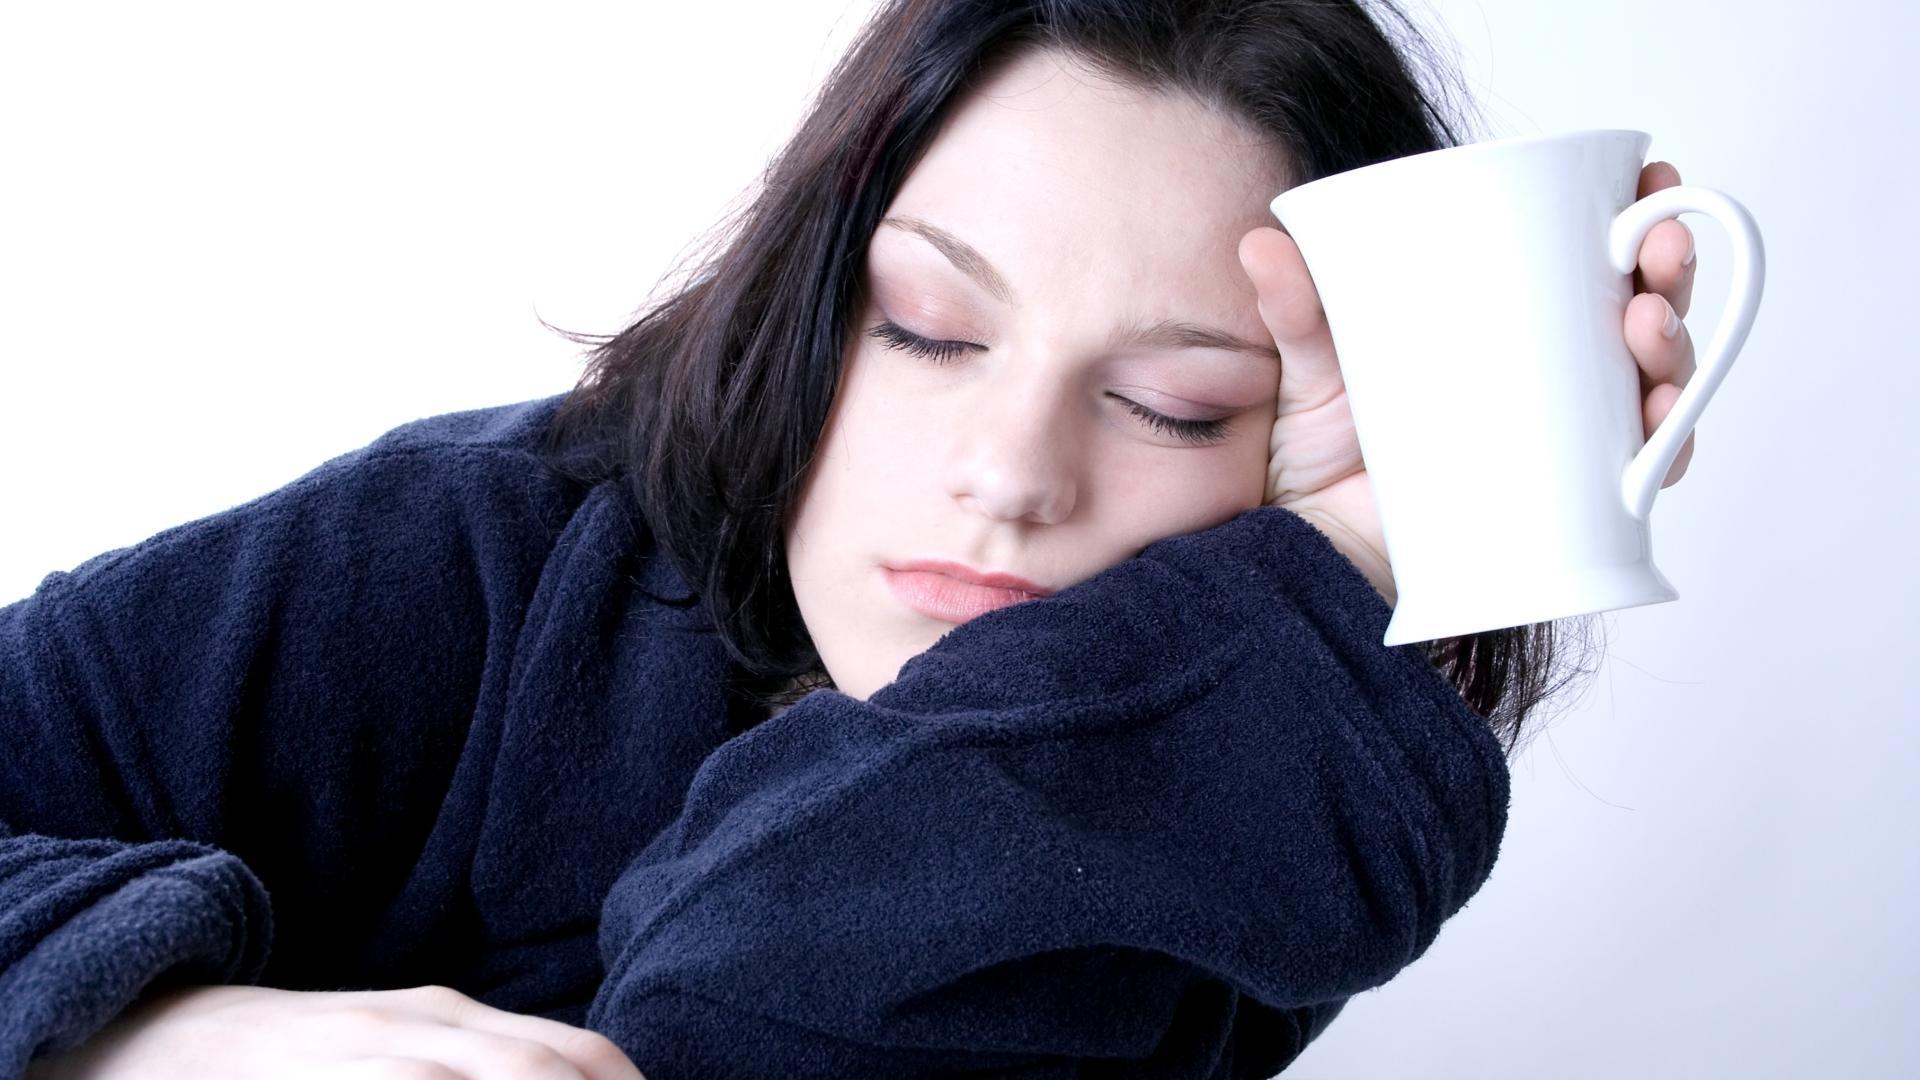 Недосып, боль и «лечебный» кофеин